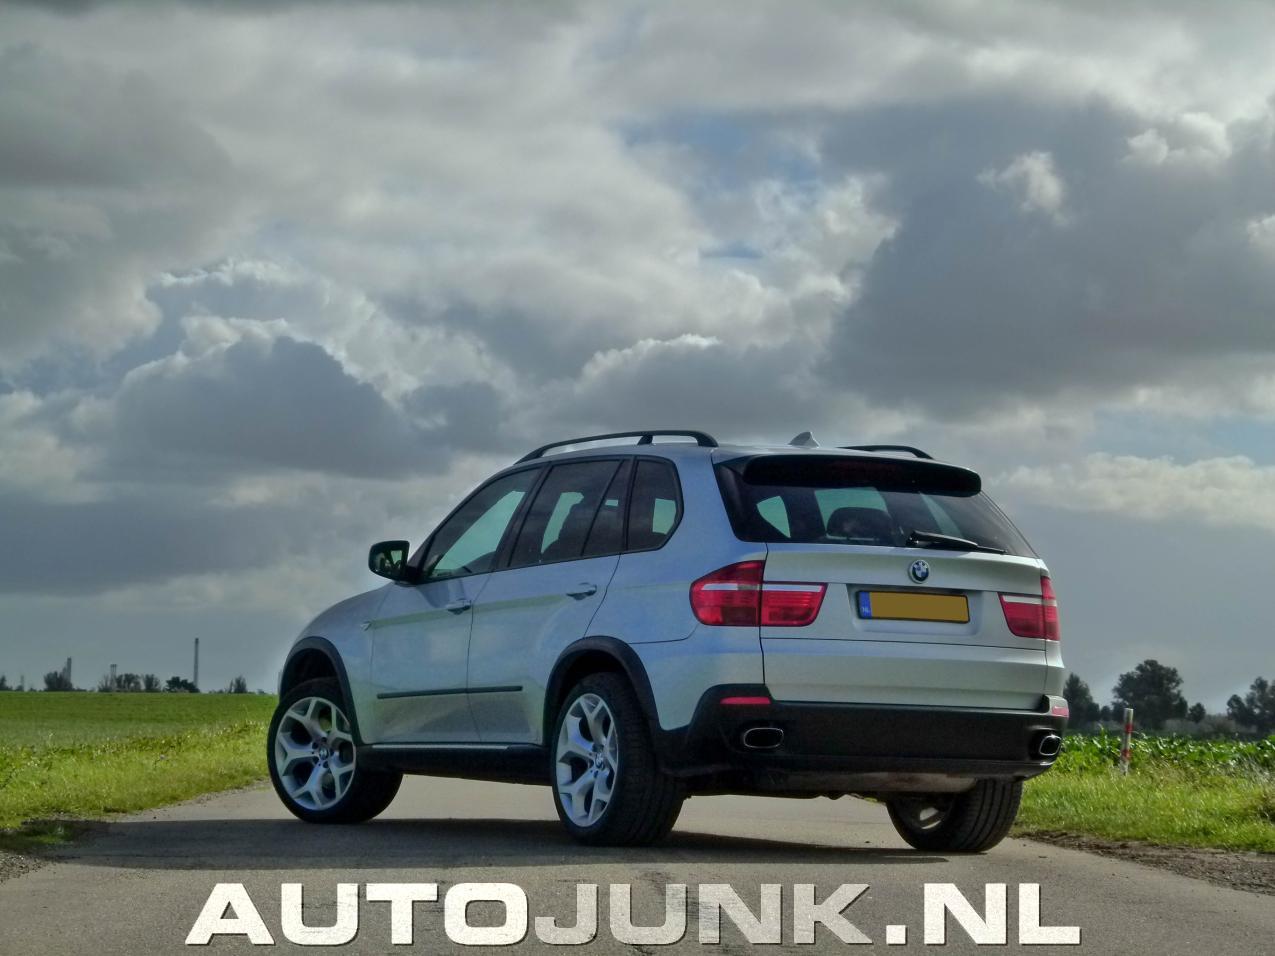 BMW X5 E70 -4.8i xDrive -2007 - foto's » Autojunk.nl (227687)